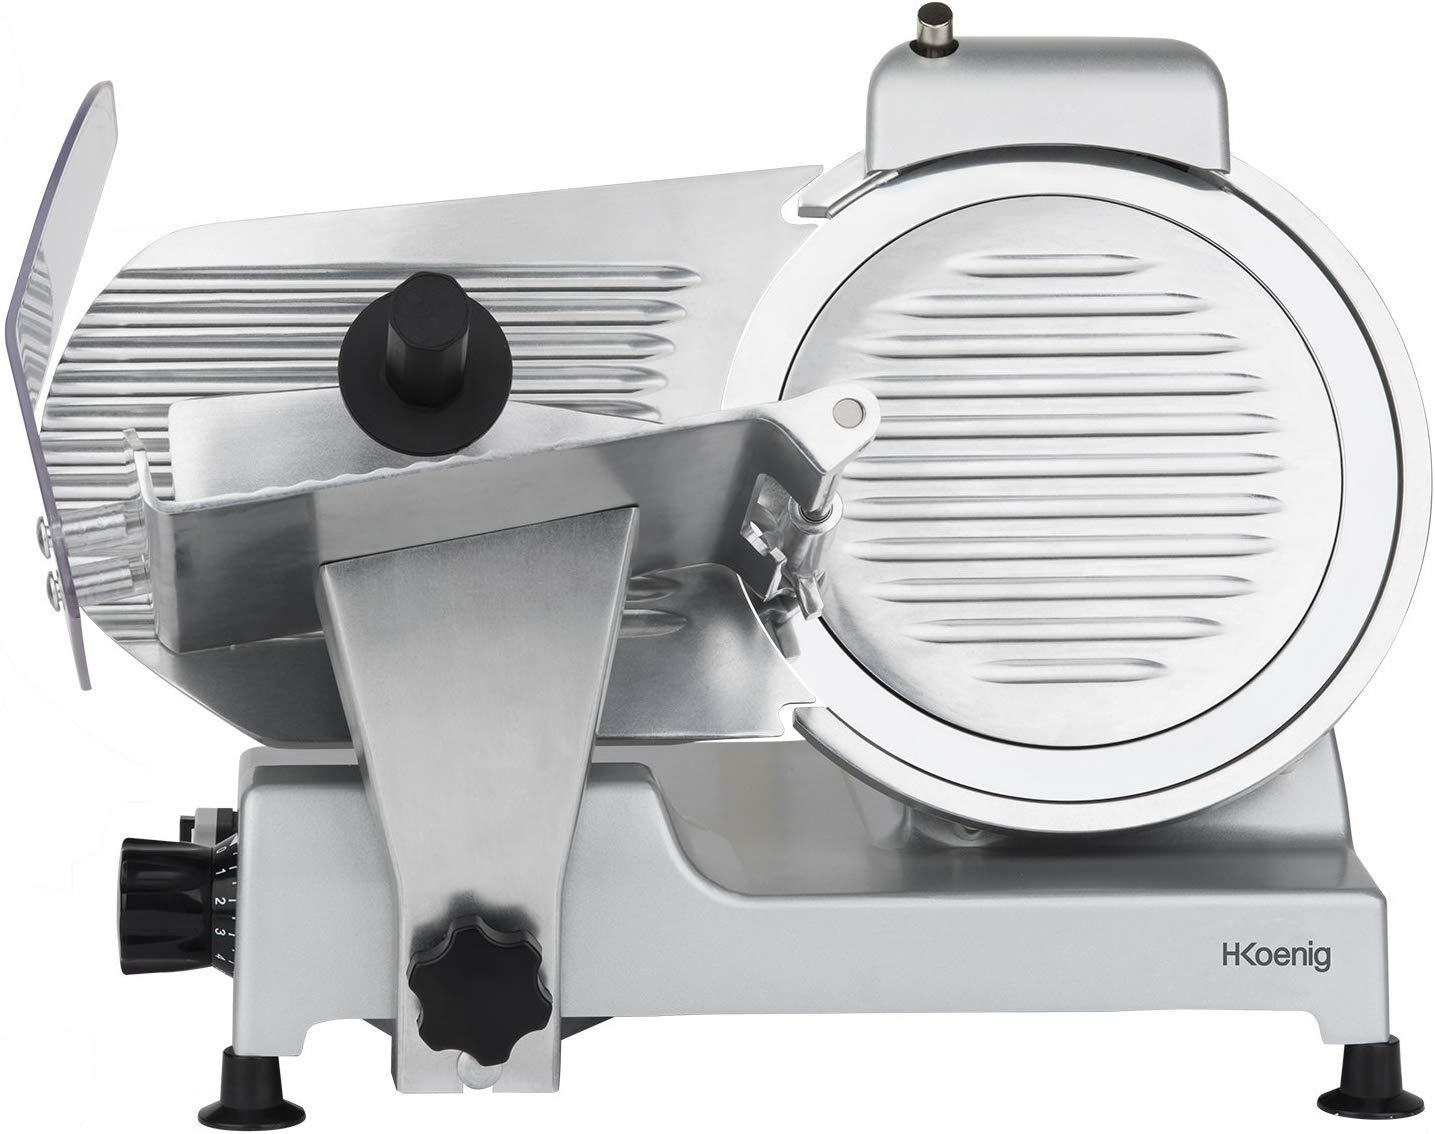 trancheuse H.Koenig MSX 250